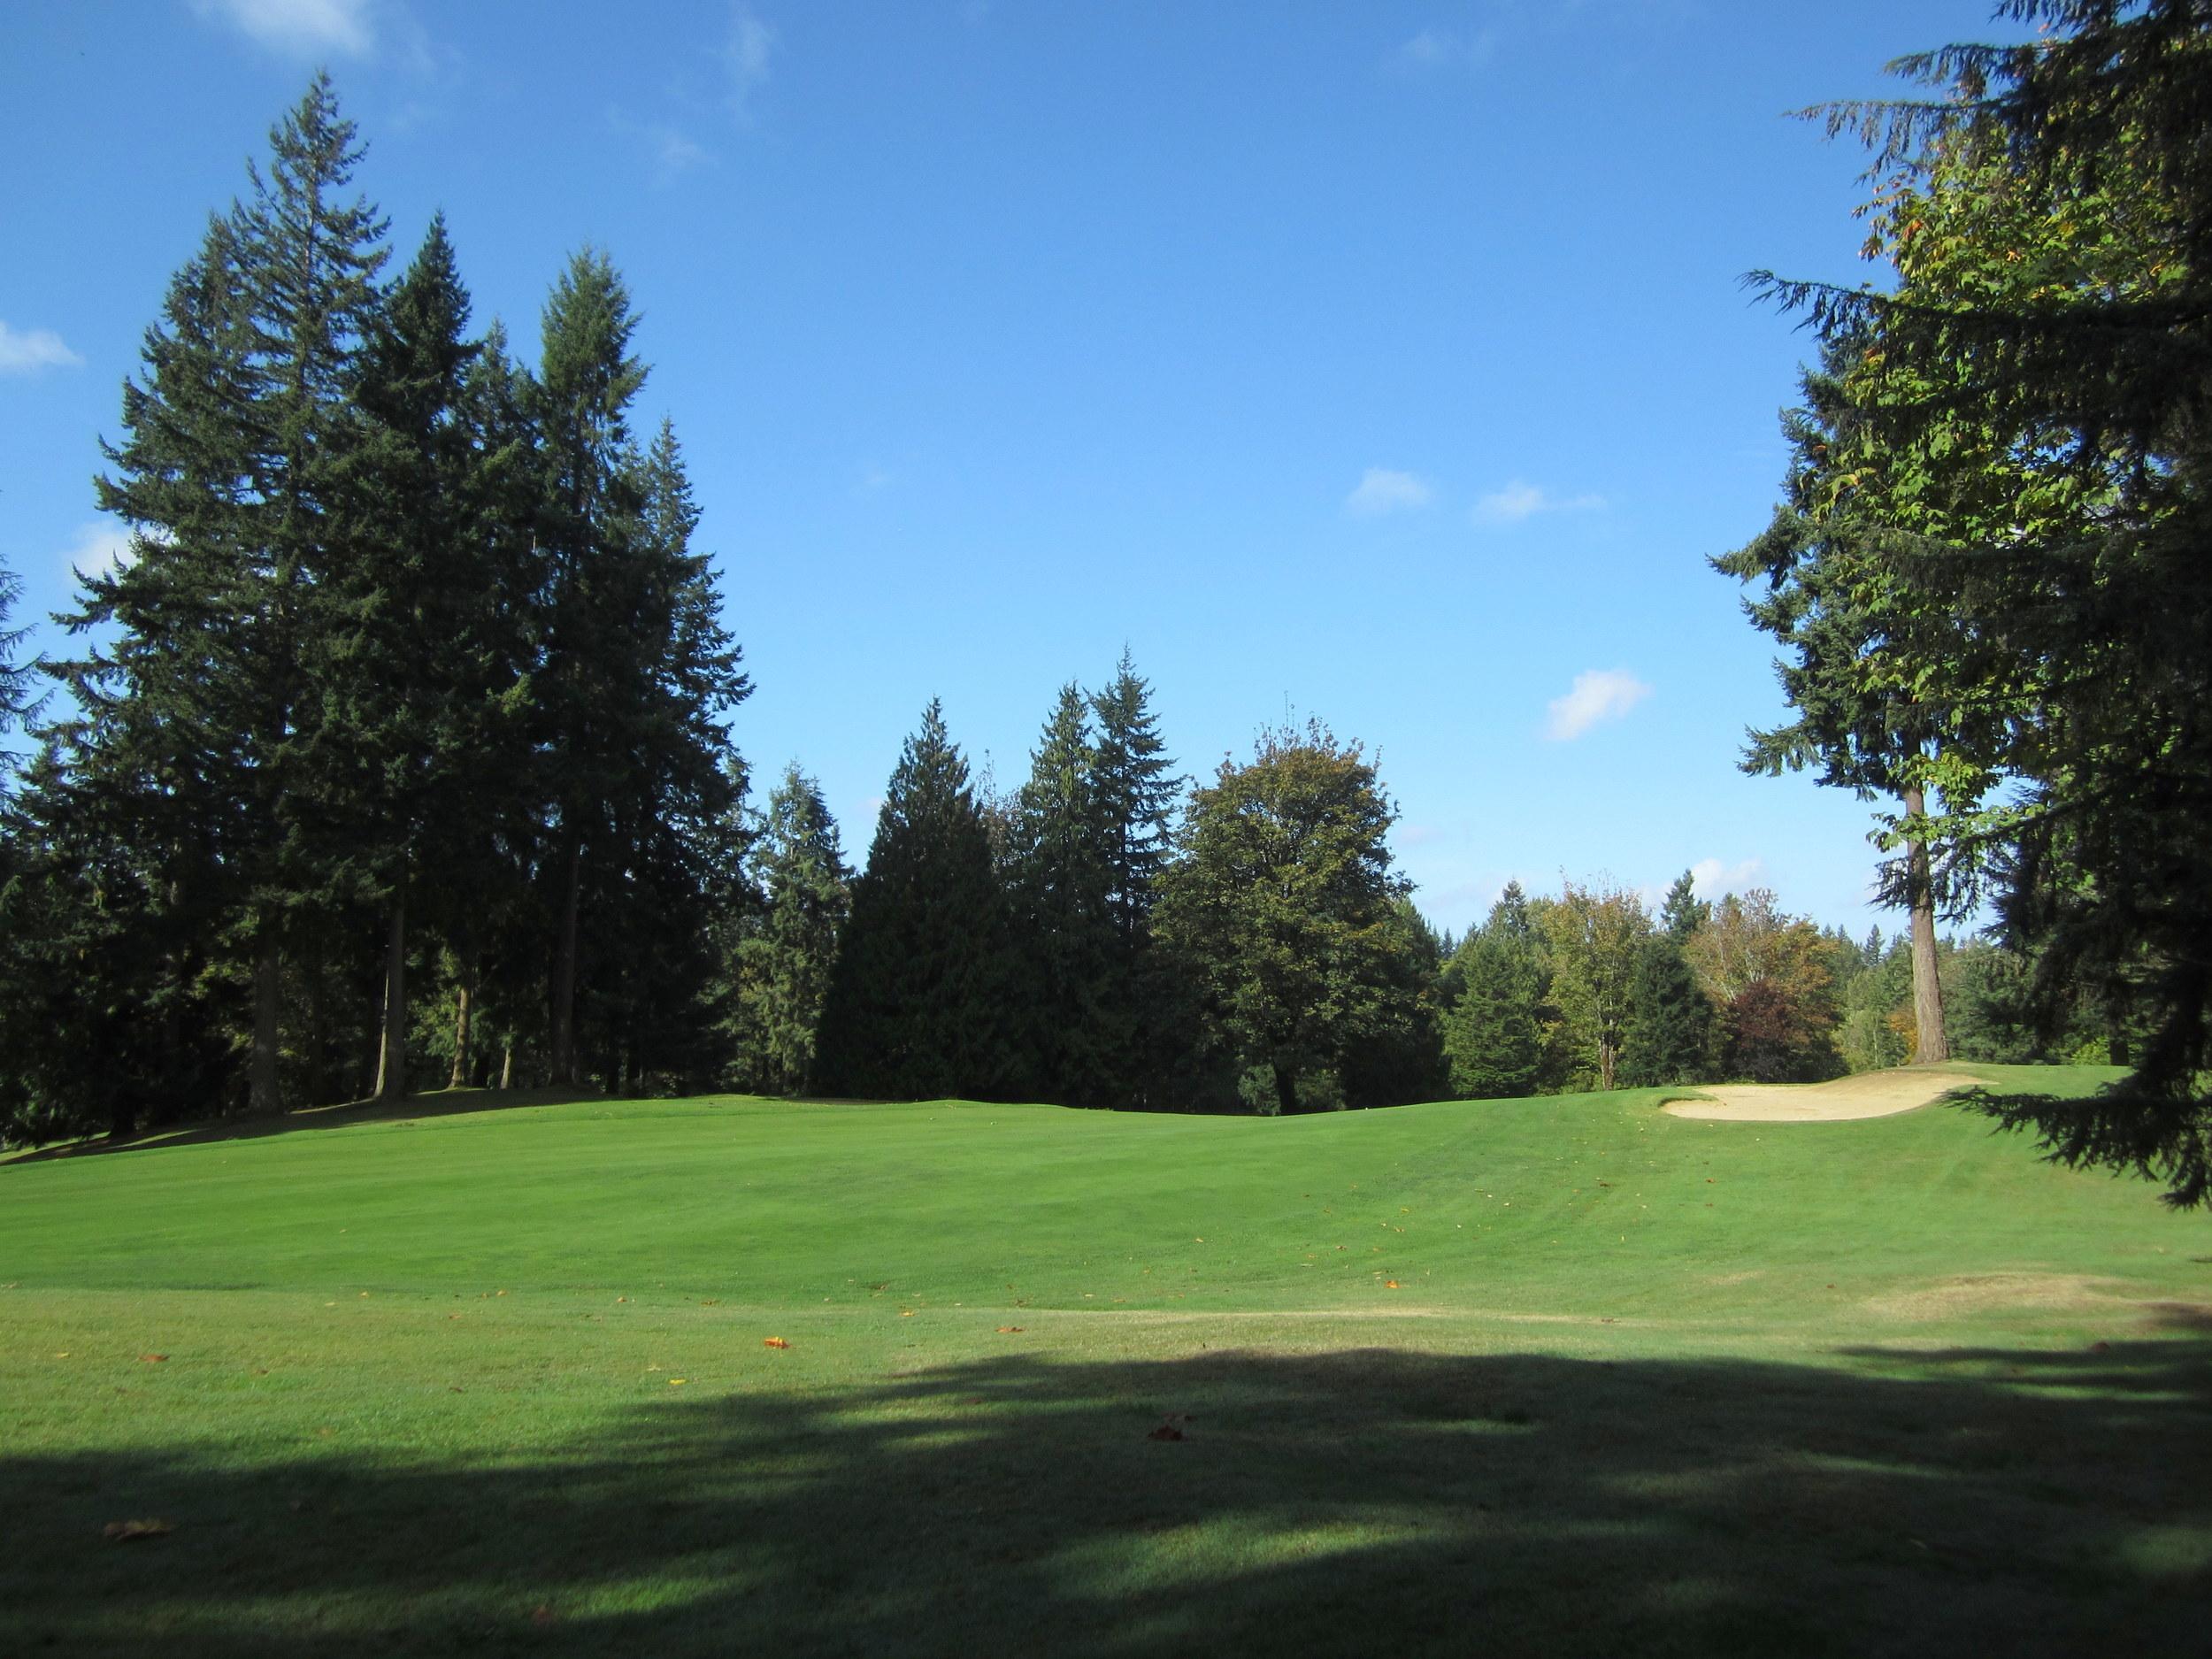 561-933522-golfcourse.JPG